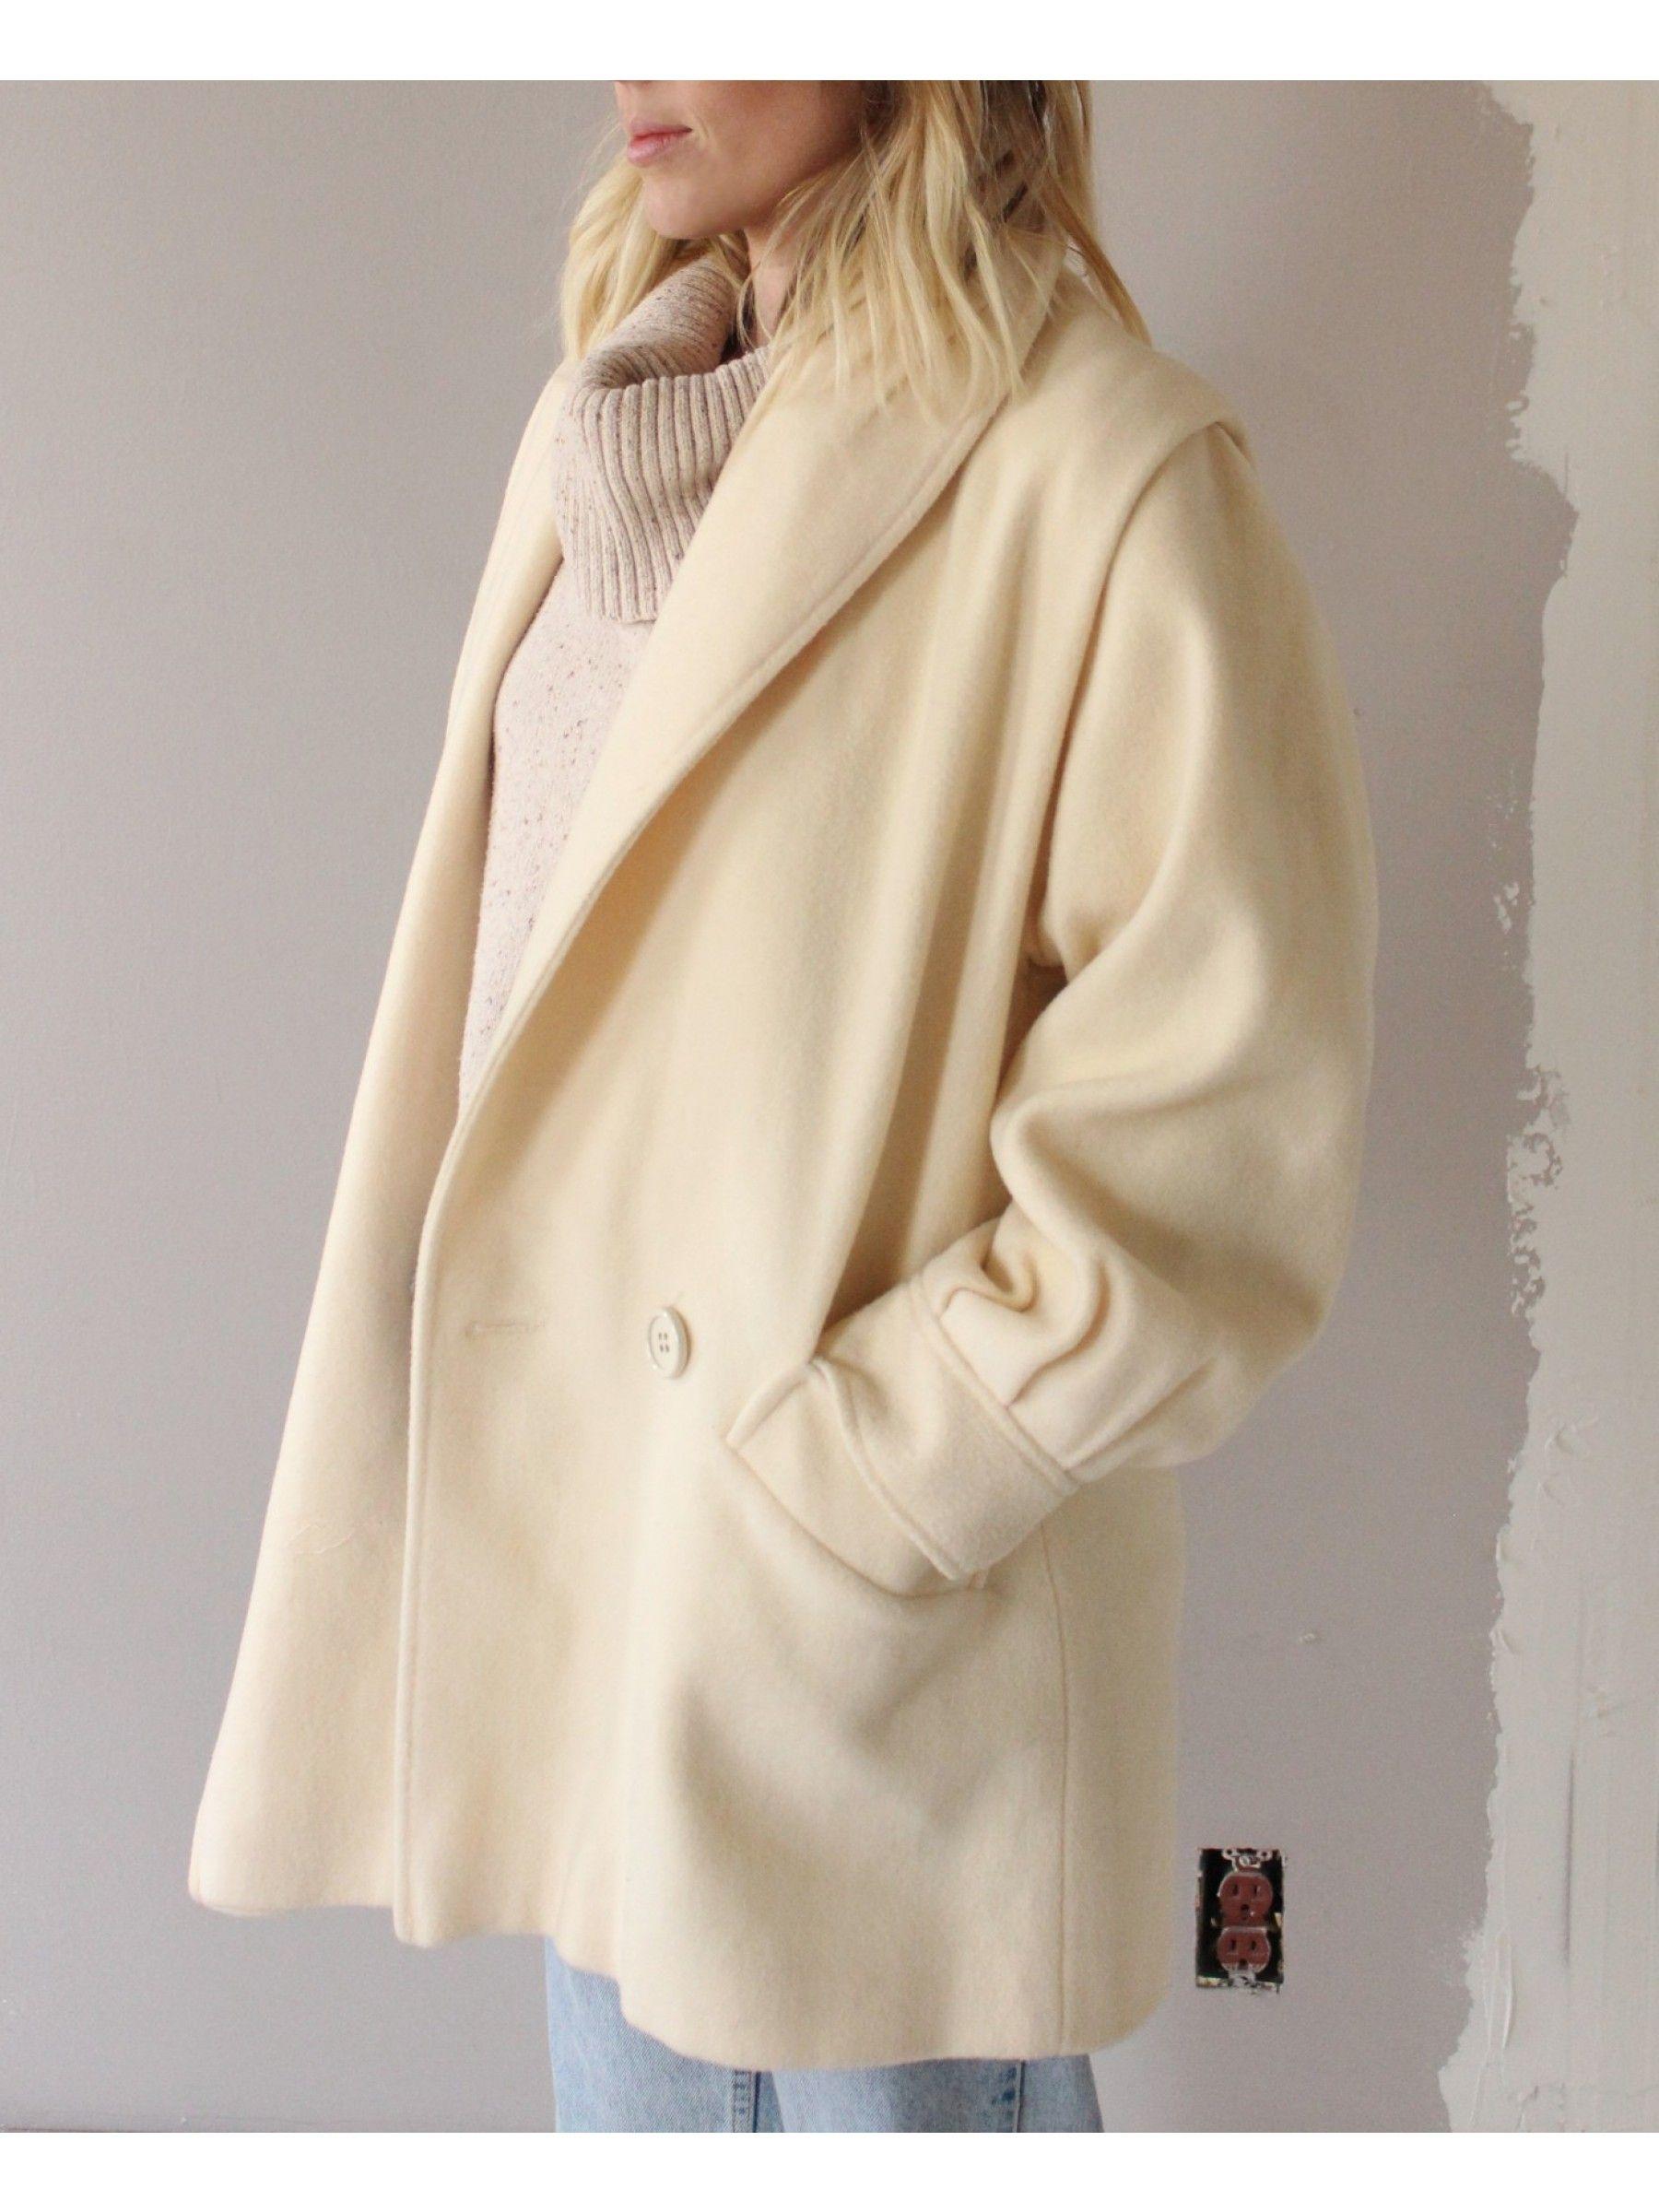 Vintage Cream Wool Coat | dear society shop | Pinterest | Wool ...